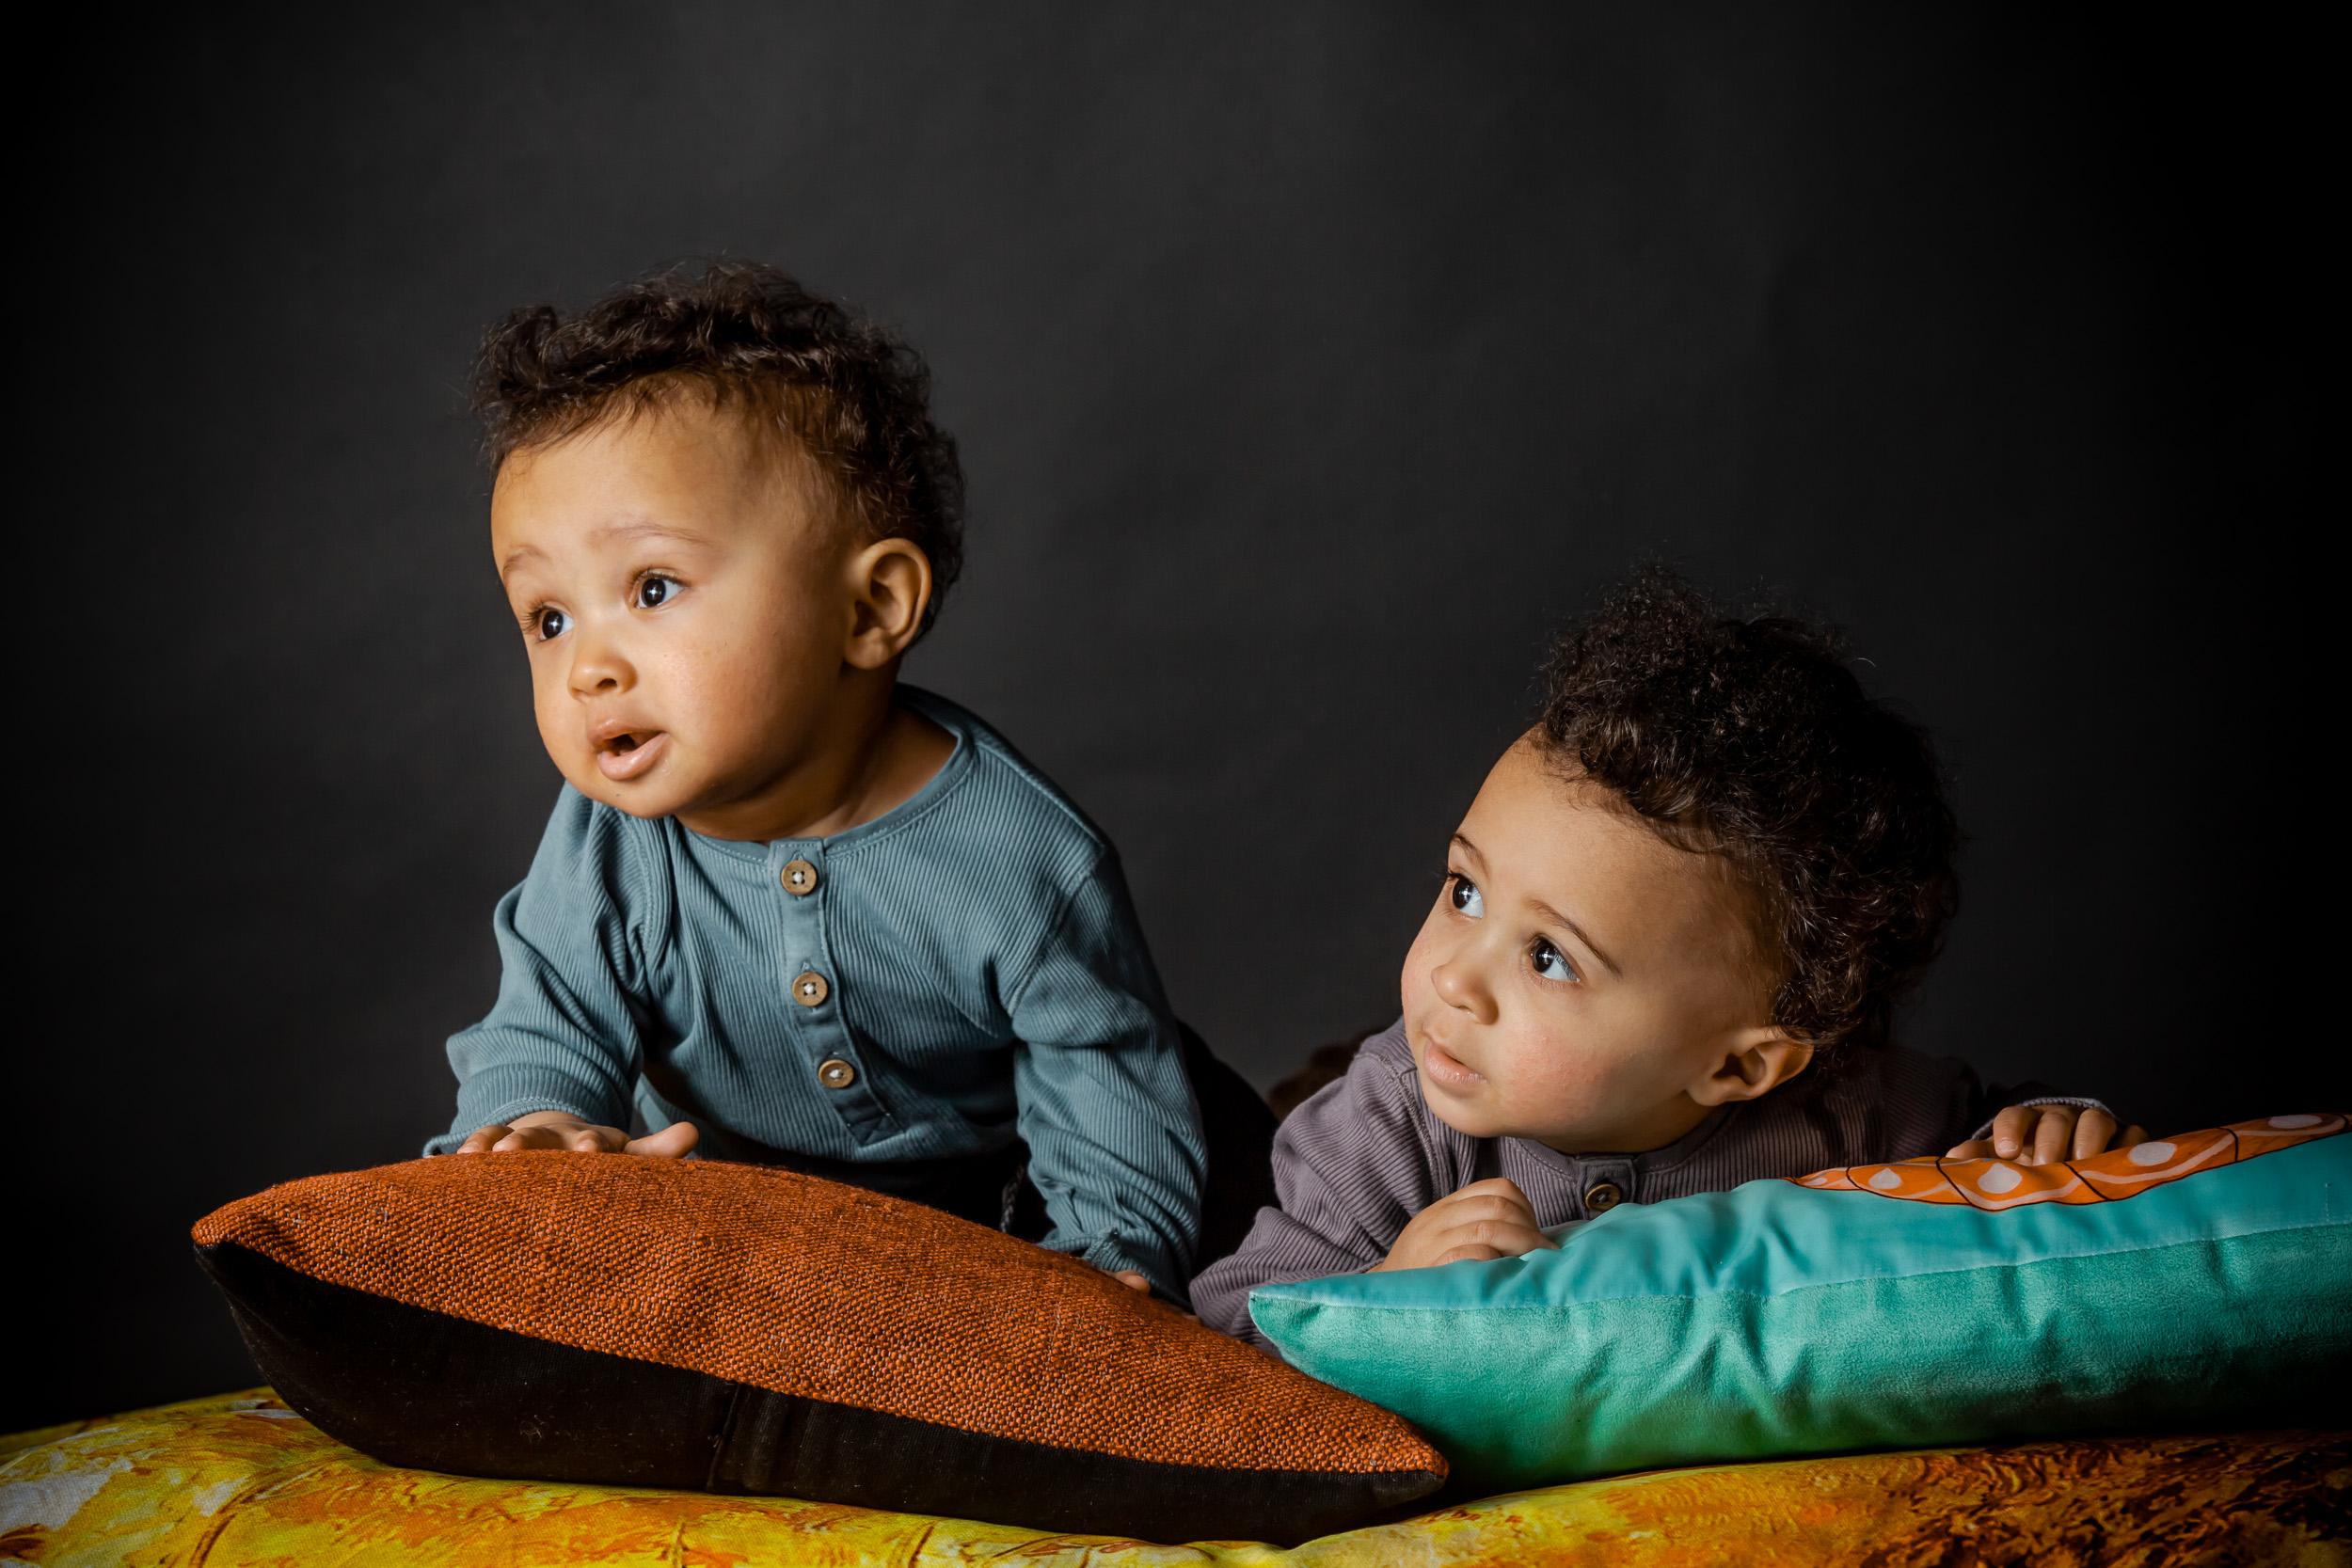 Perhekuvaus-lapsikuvaus-vauvakuvaus-raskaus-valokuvaaja-helsinki-alejandro lorenzo-028.jpg